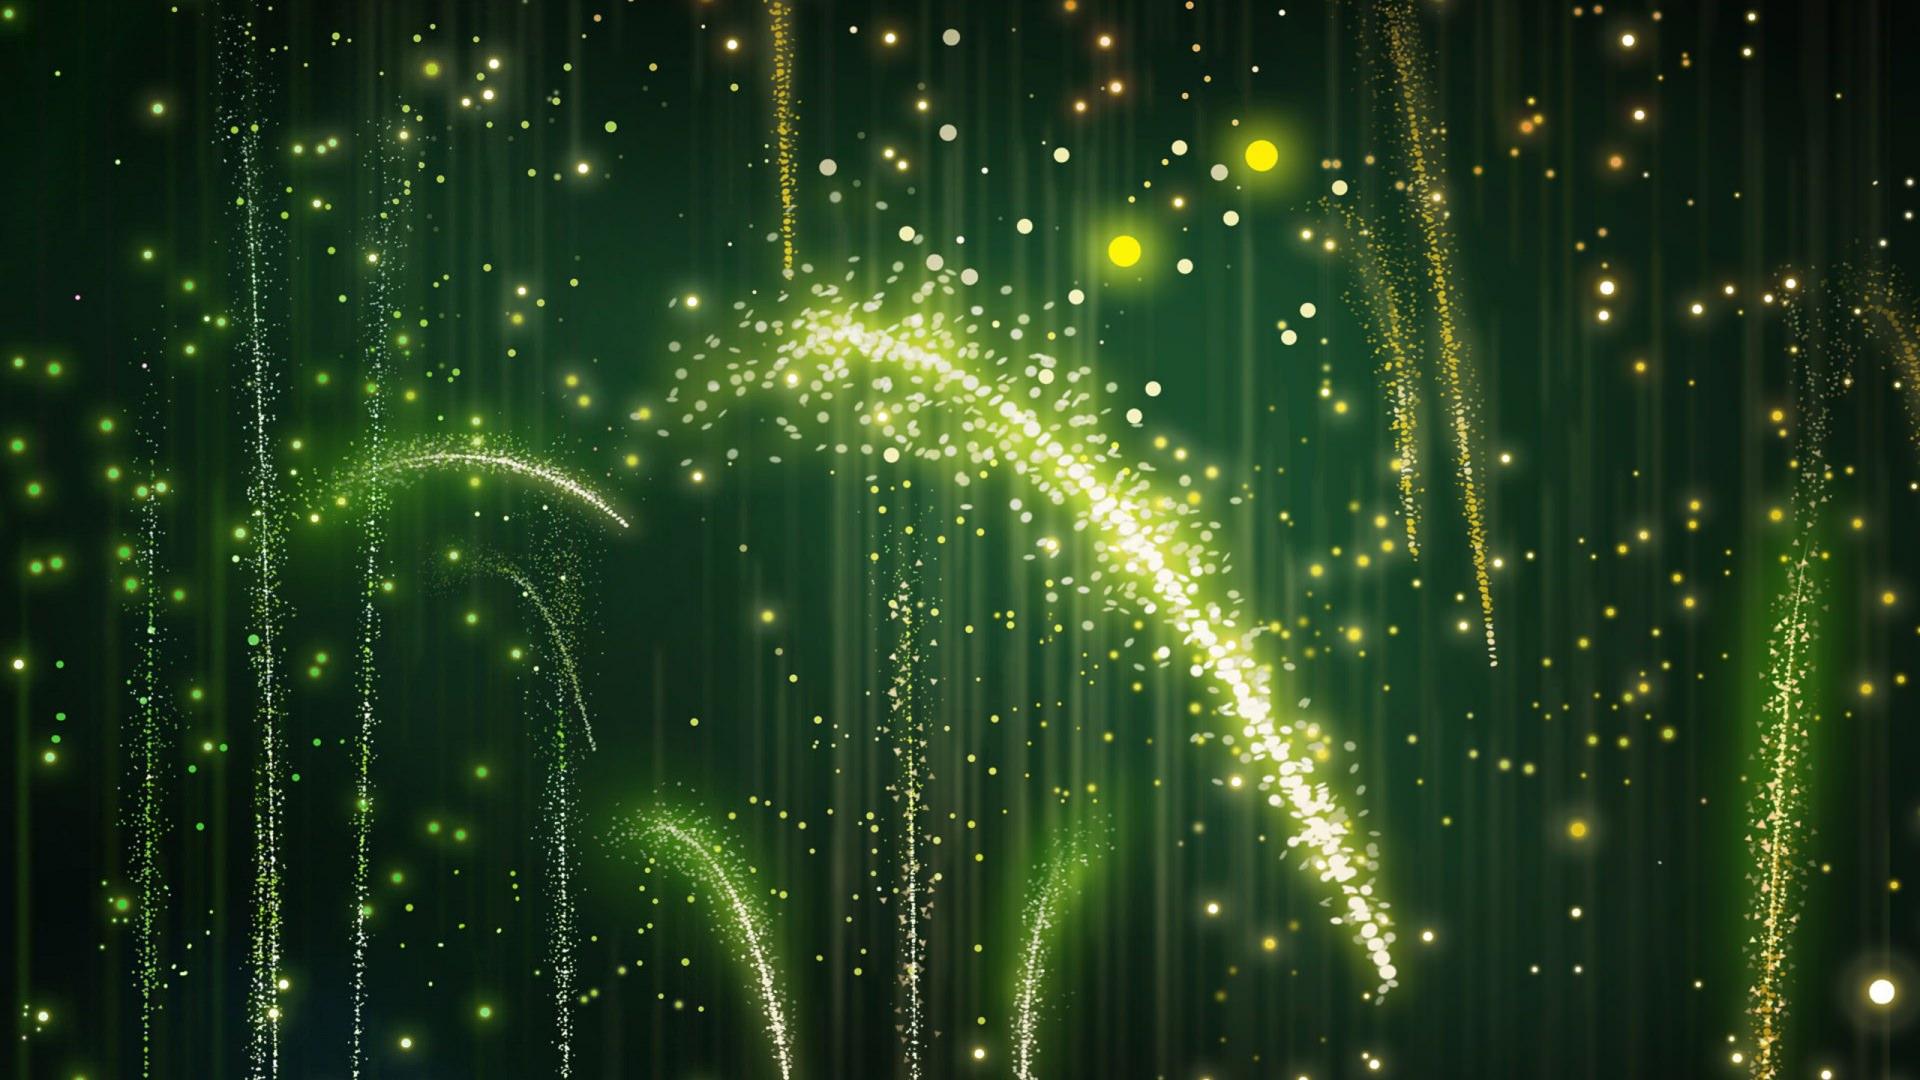 Explosion Glitter Wallpaper